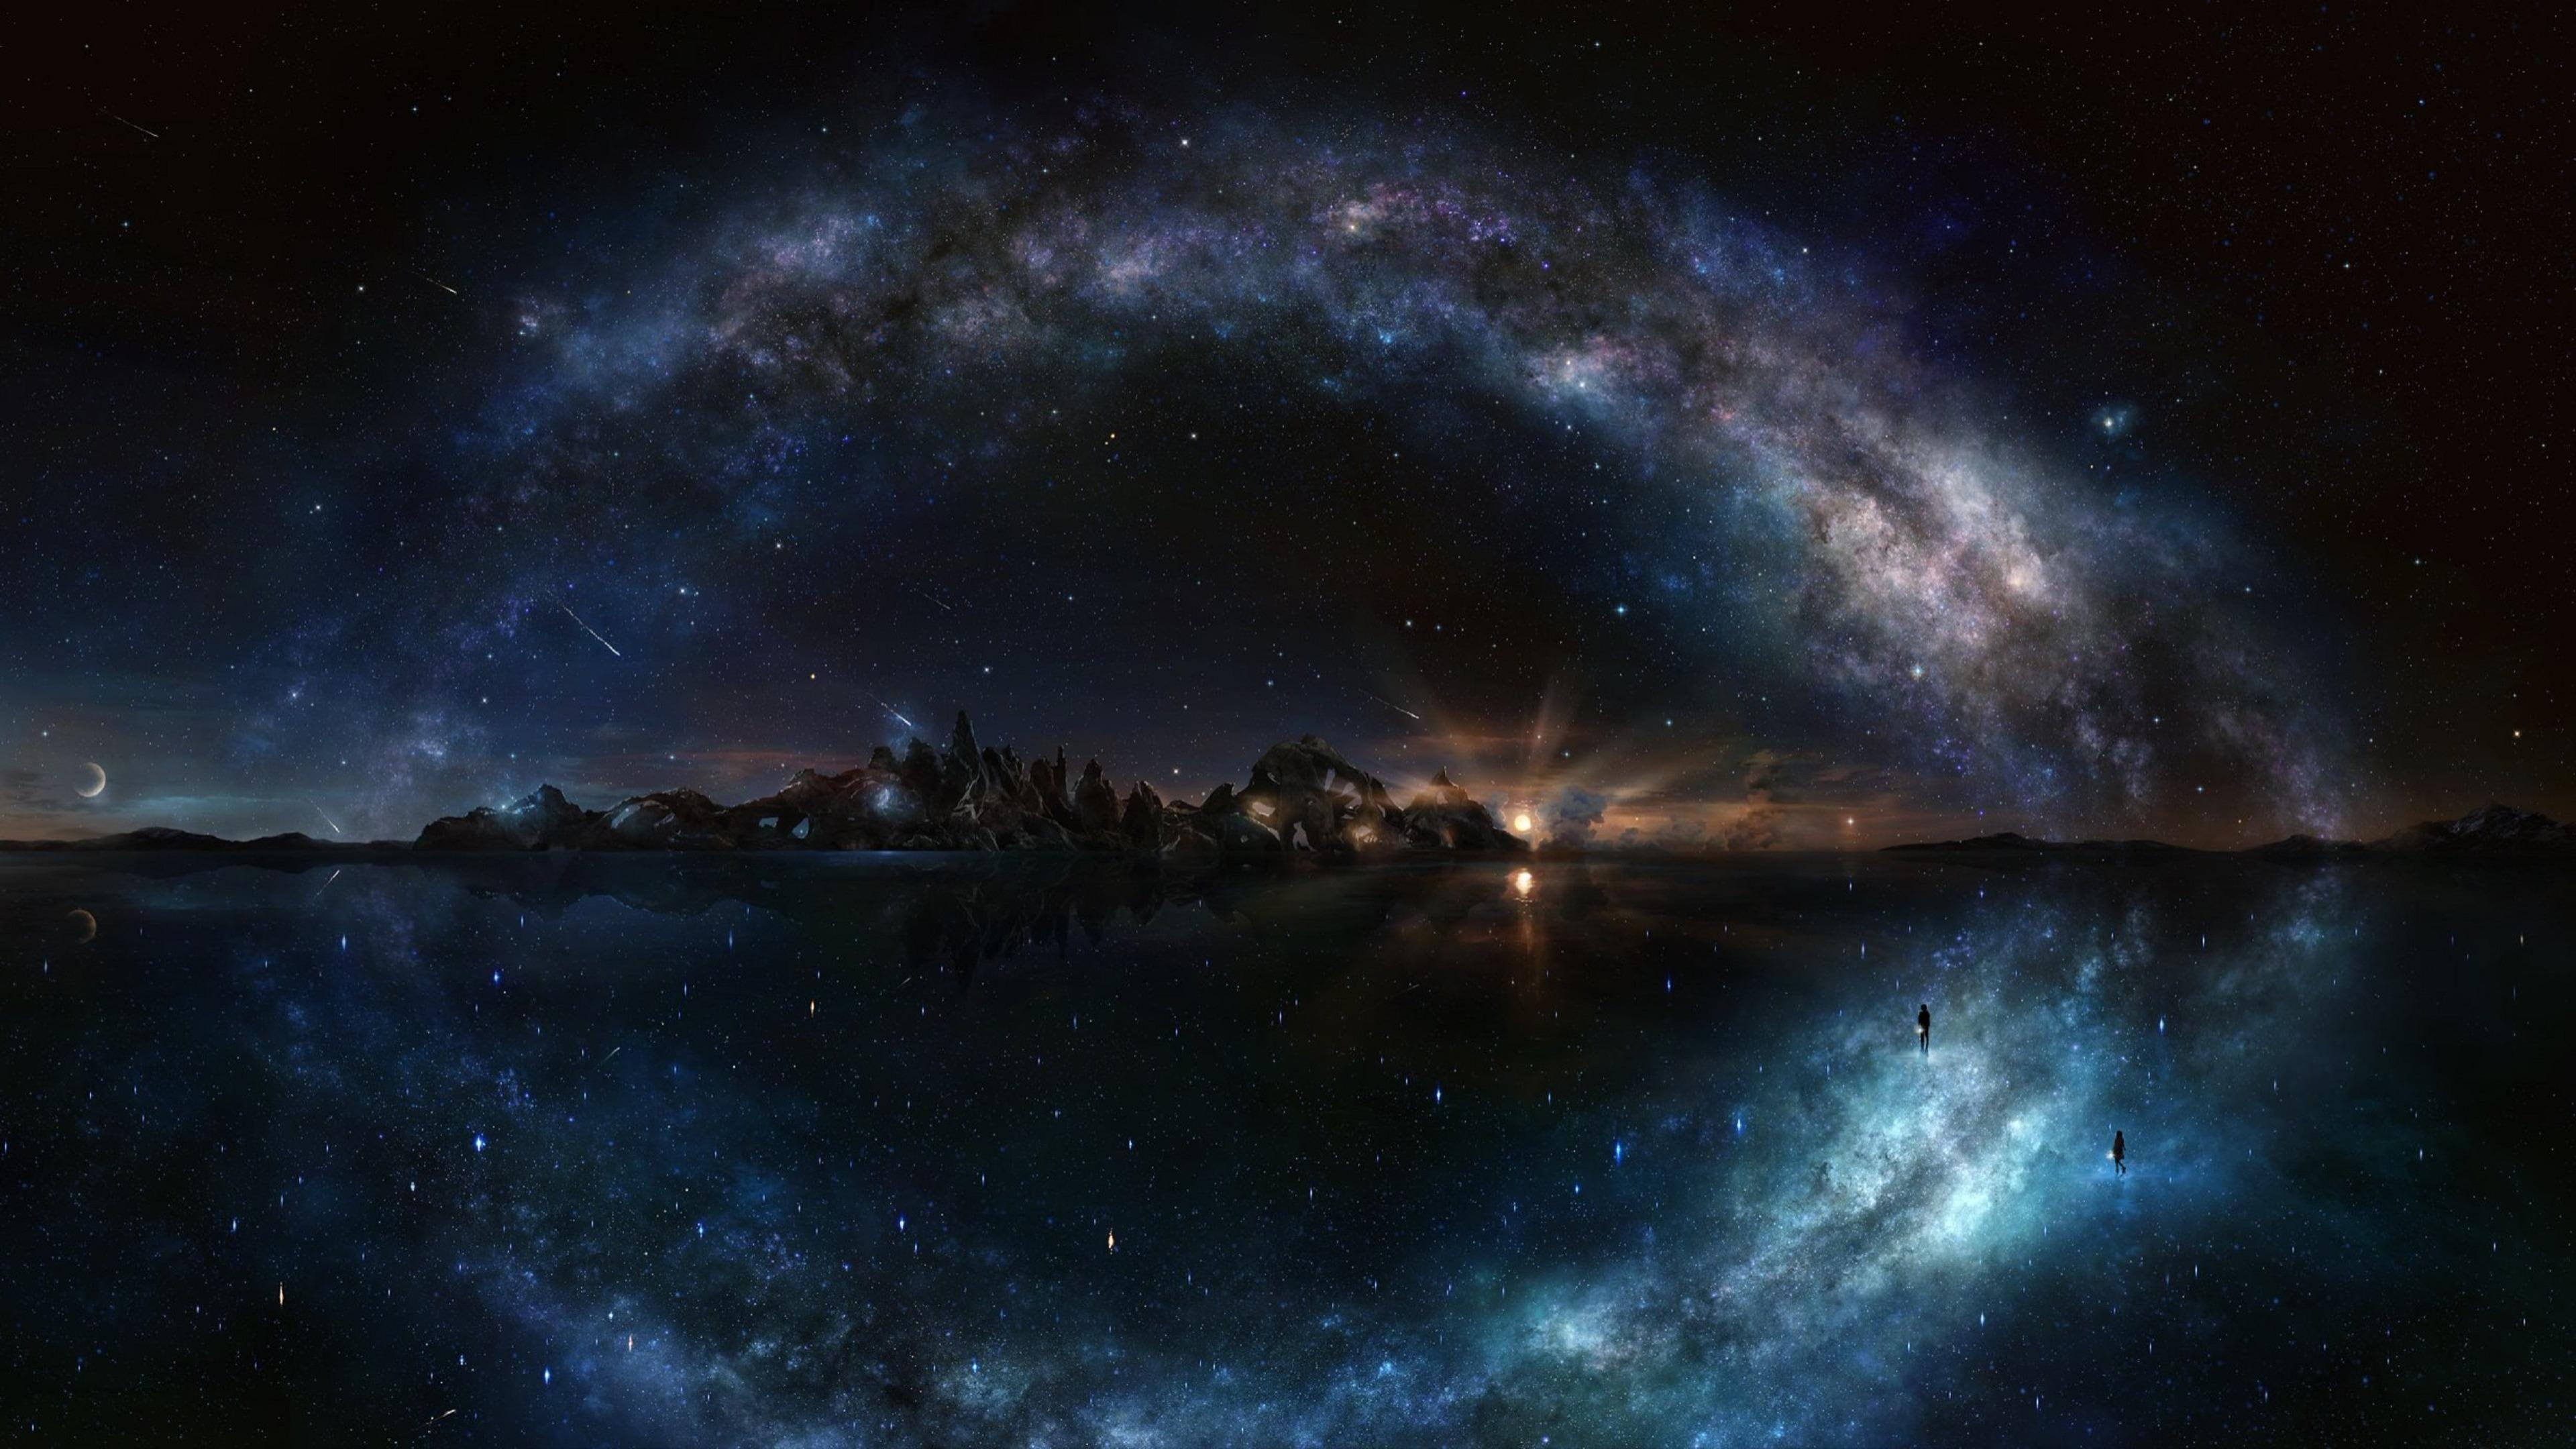 Galaxy Sky 4k Google Search Night Sky Wallpaper Night Skies Sky